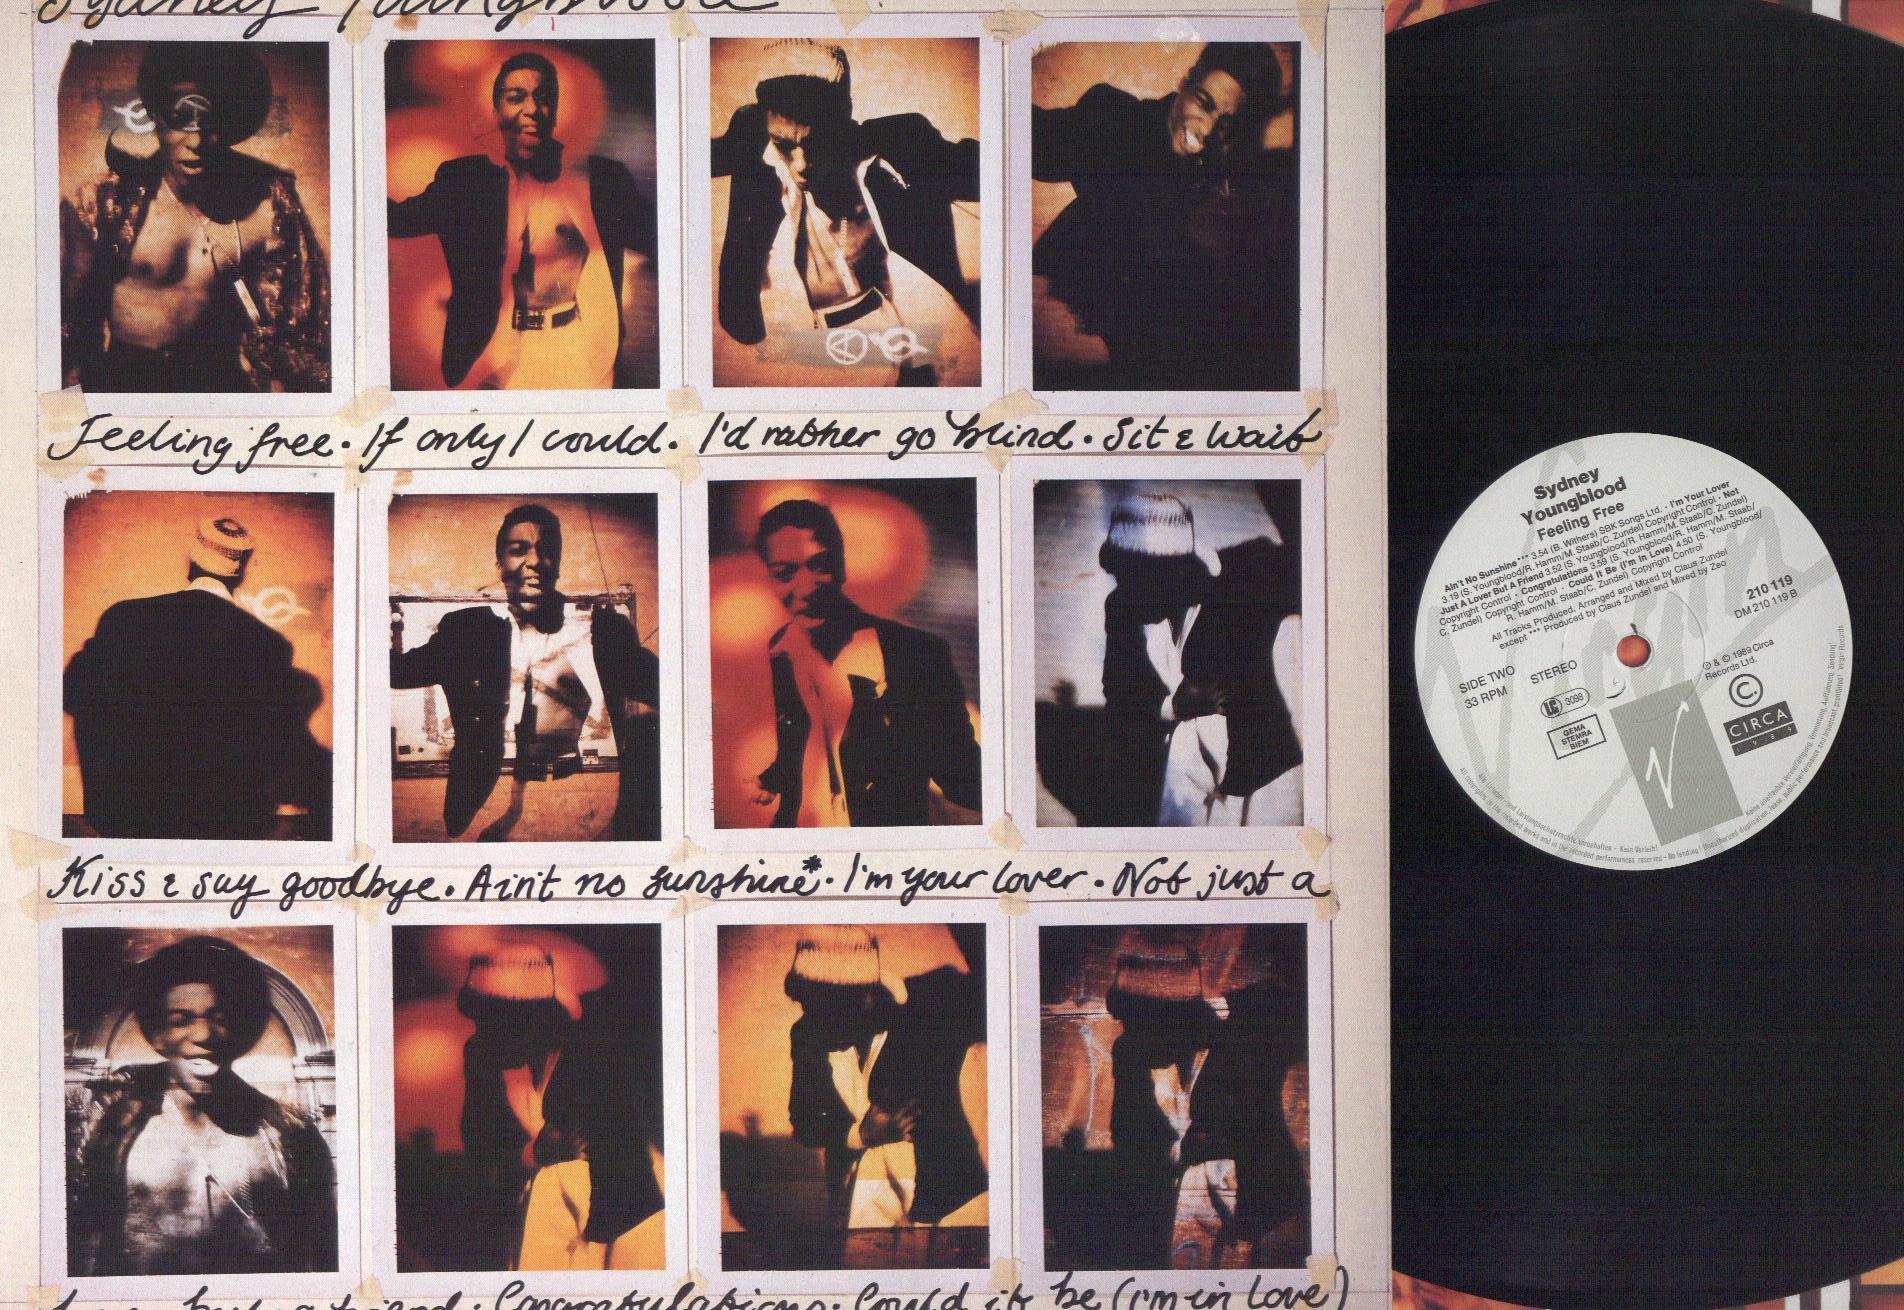 SYDNEY YOUNGBLOOD - Feeling Free - LP